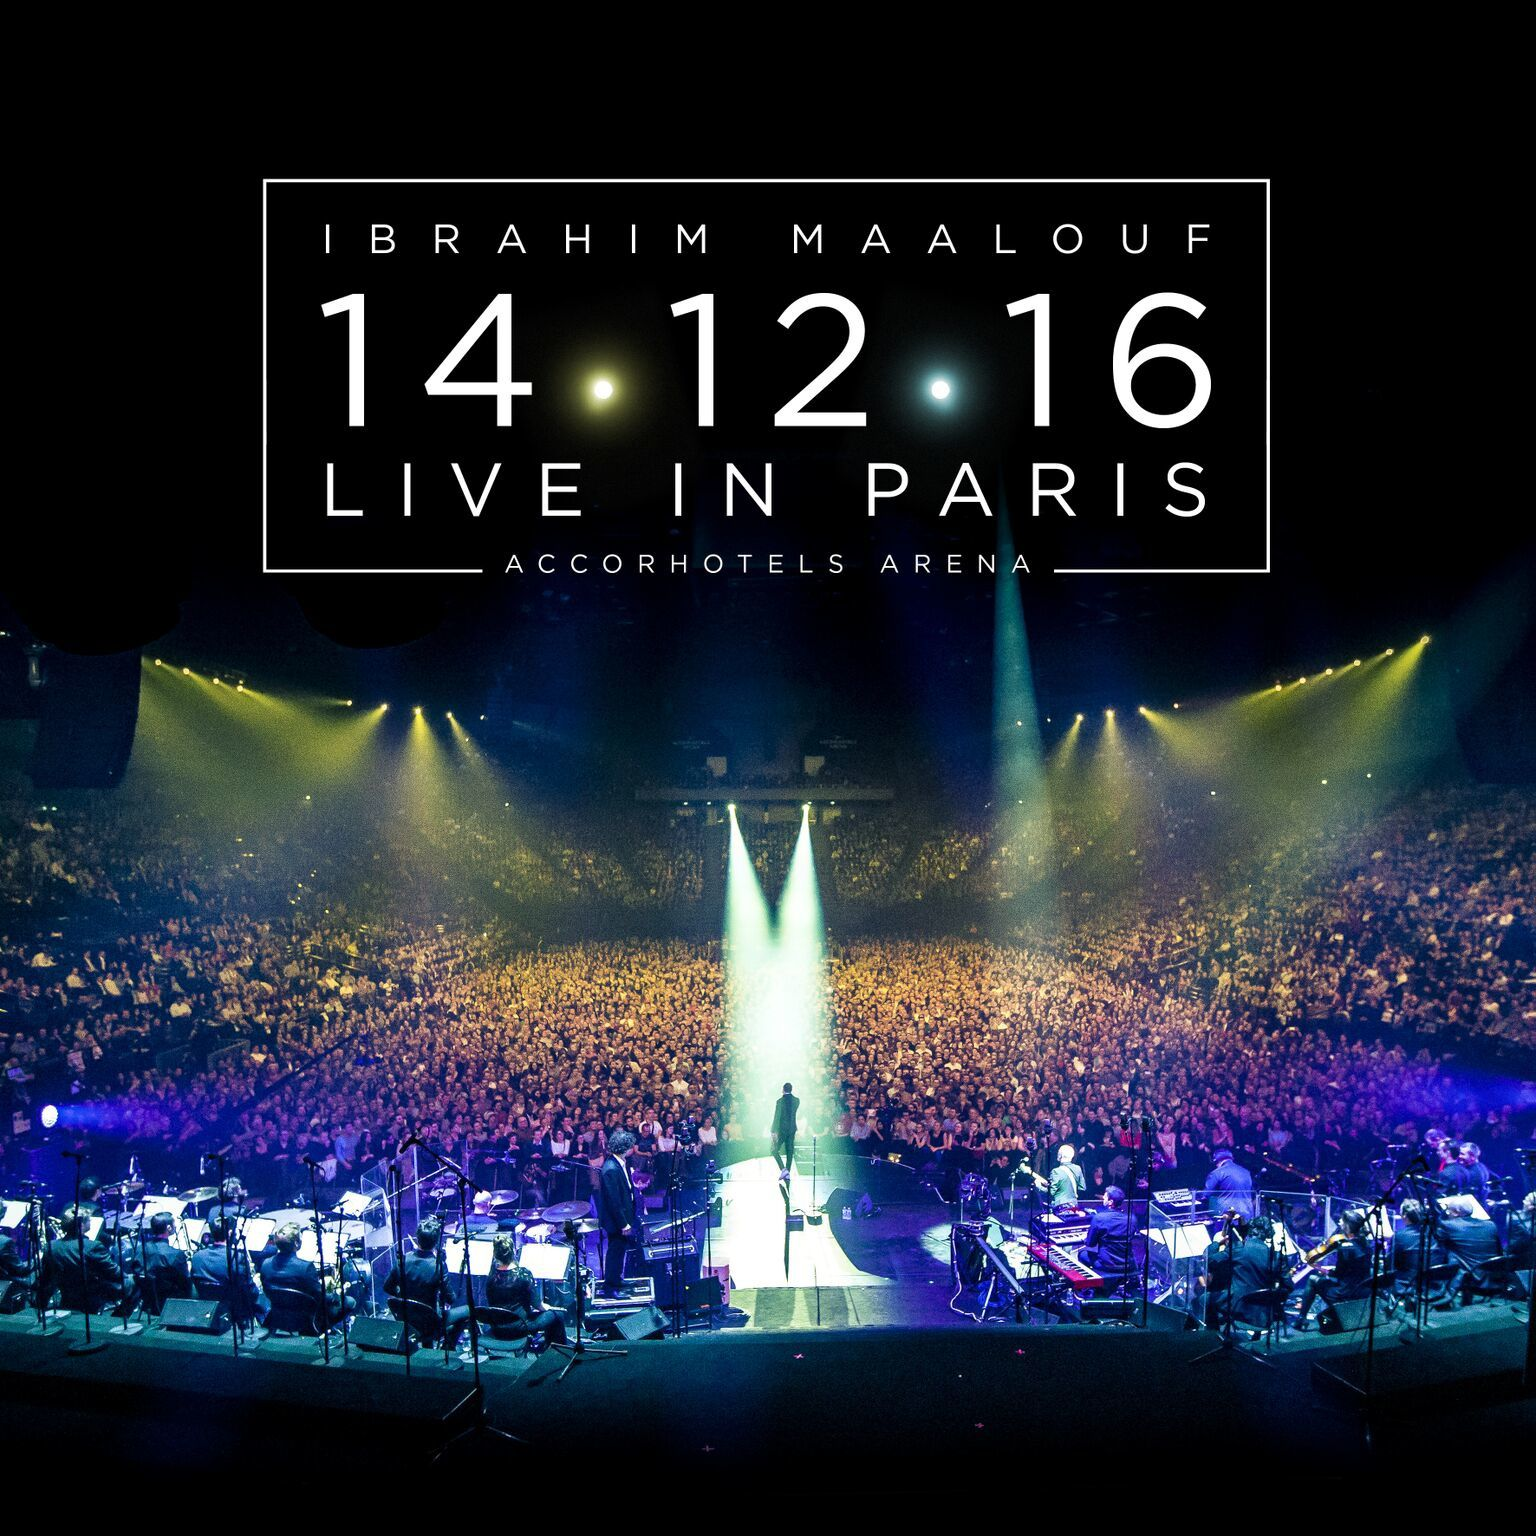 Ibrahim Maalouf, Live In Paris - 14.12.16